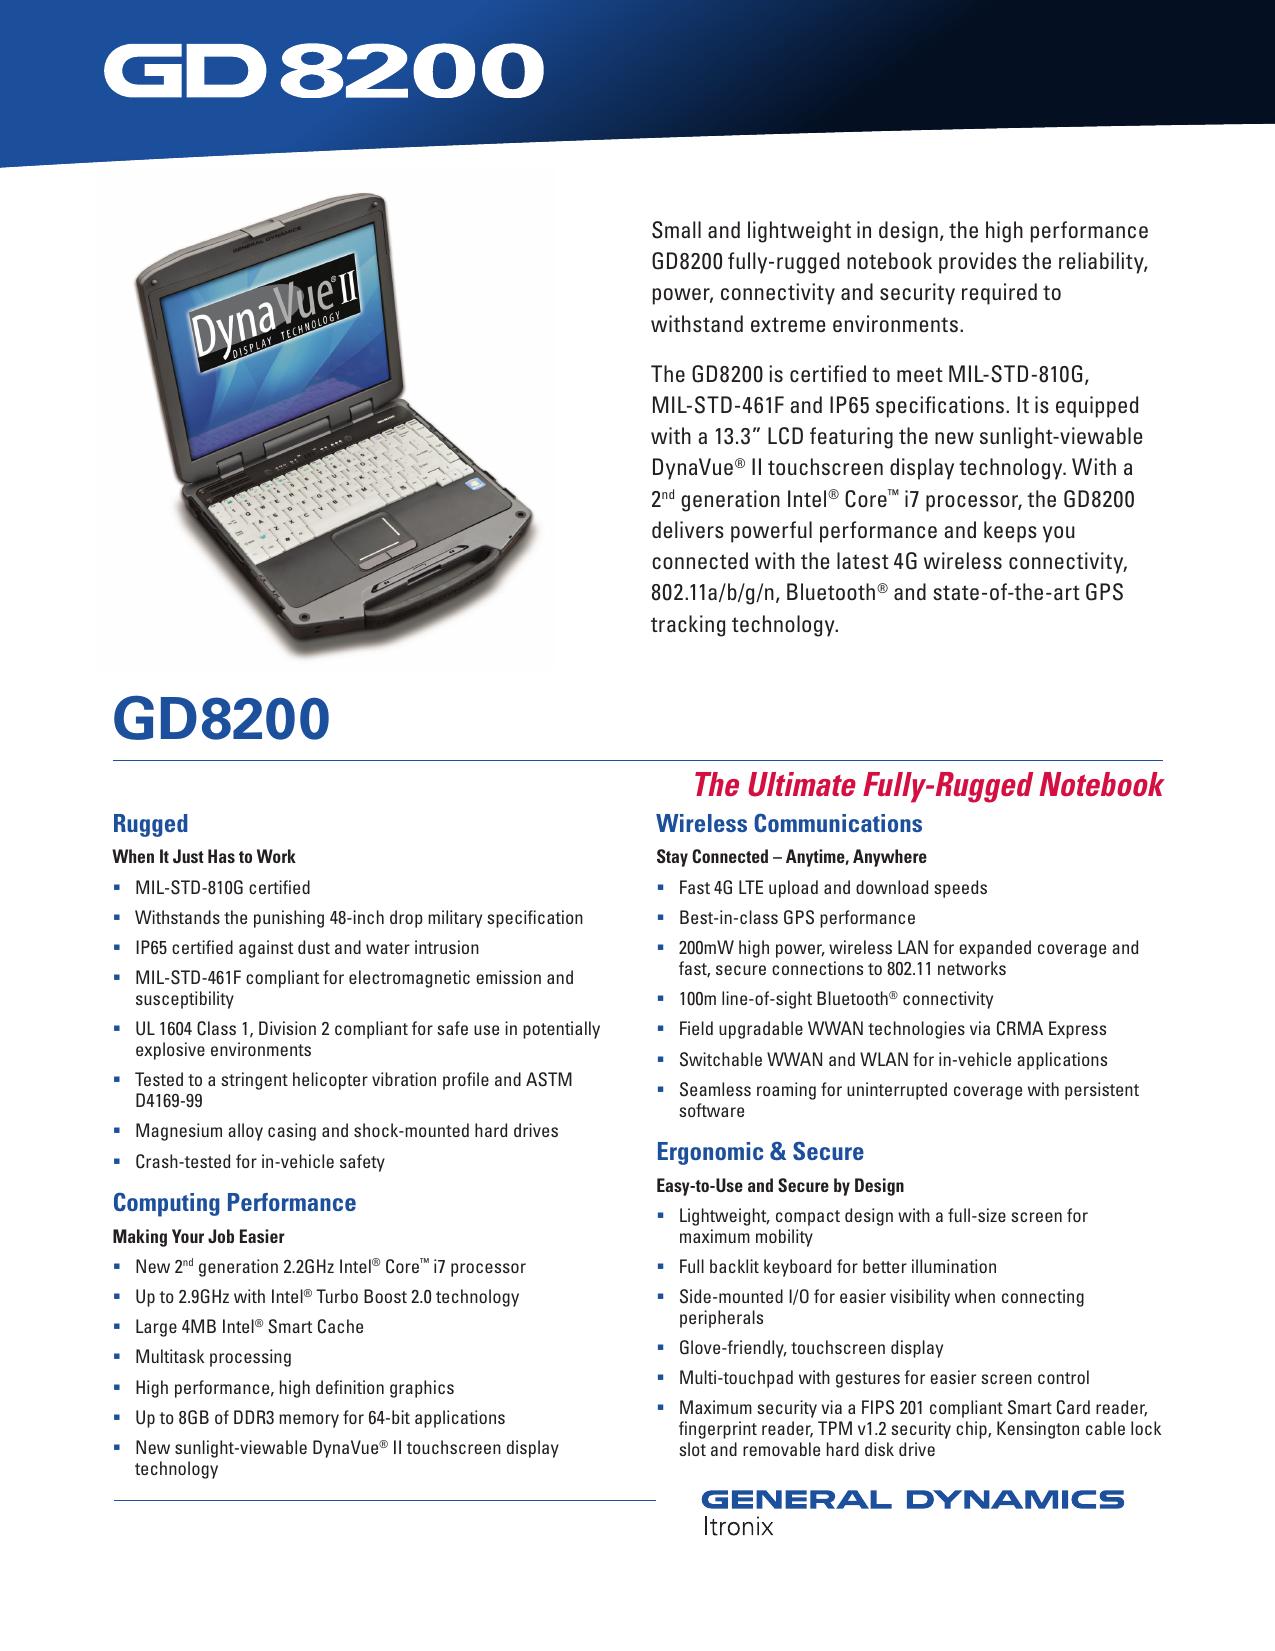 ITRONIX GD8200 NON-VPRO DRIVER (2019)